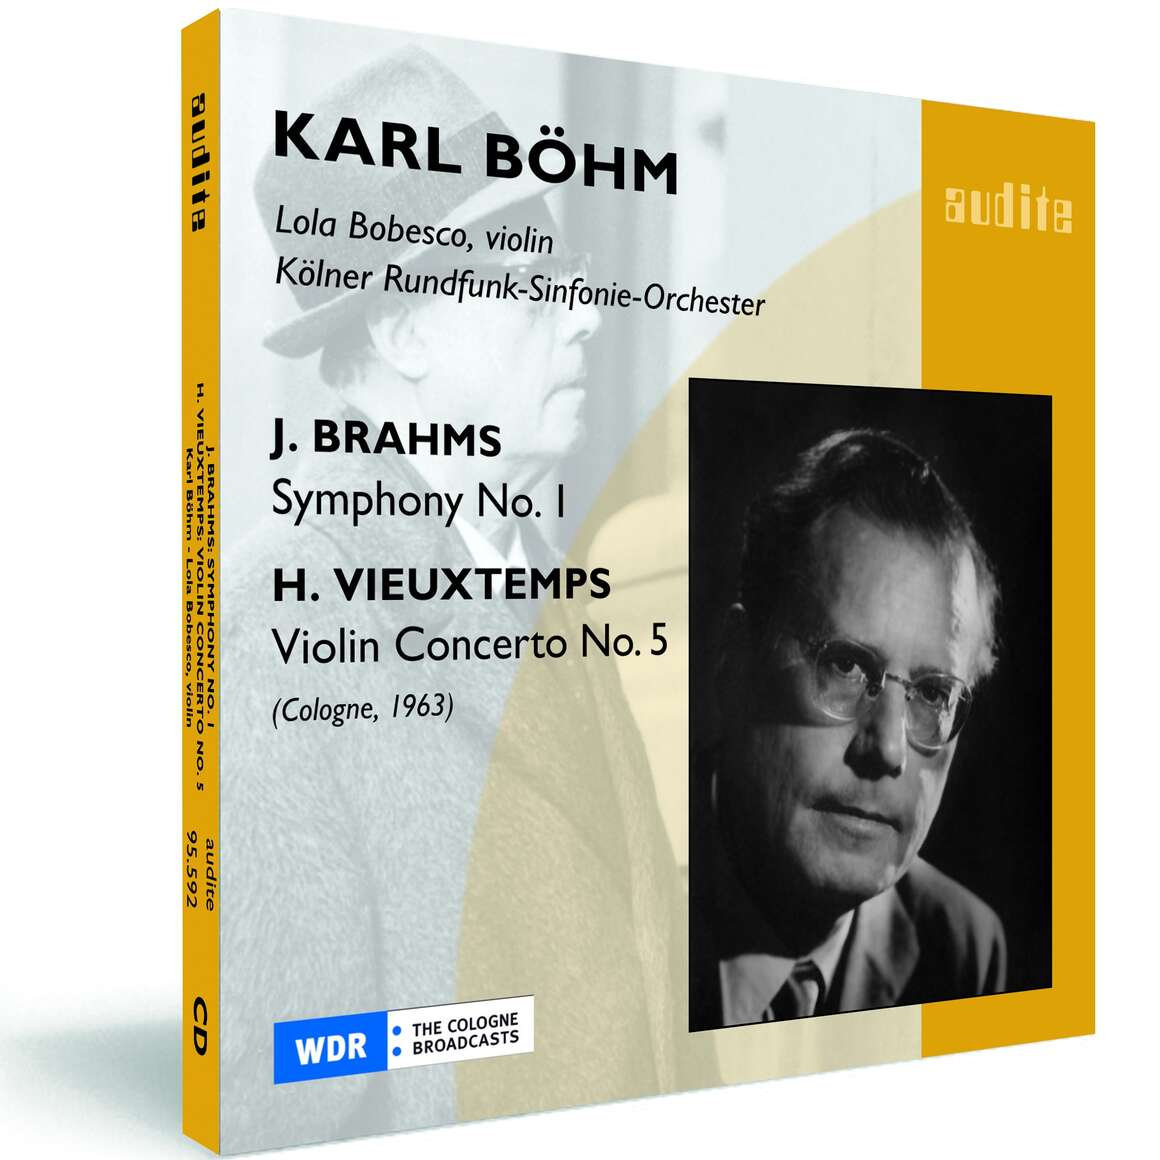 J. Brahms: Symphony No. 1 & H. Vieuxtemps: Violin Concerto No. 5